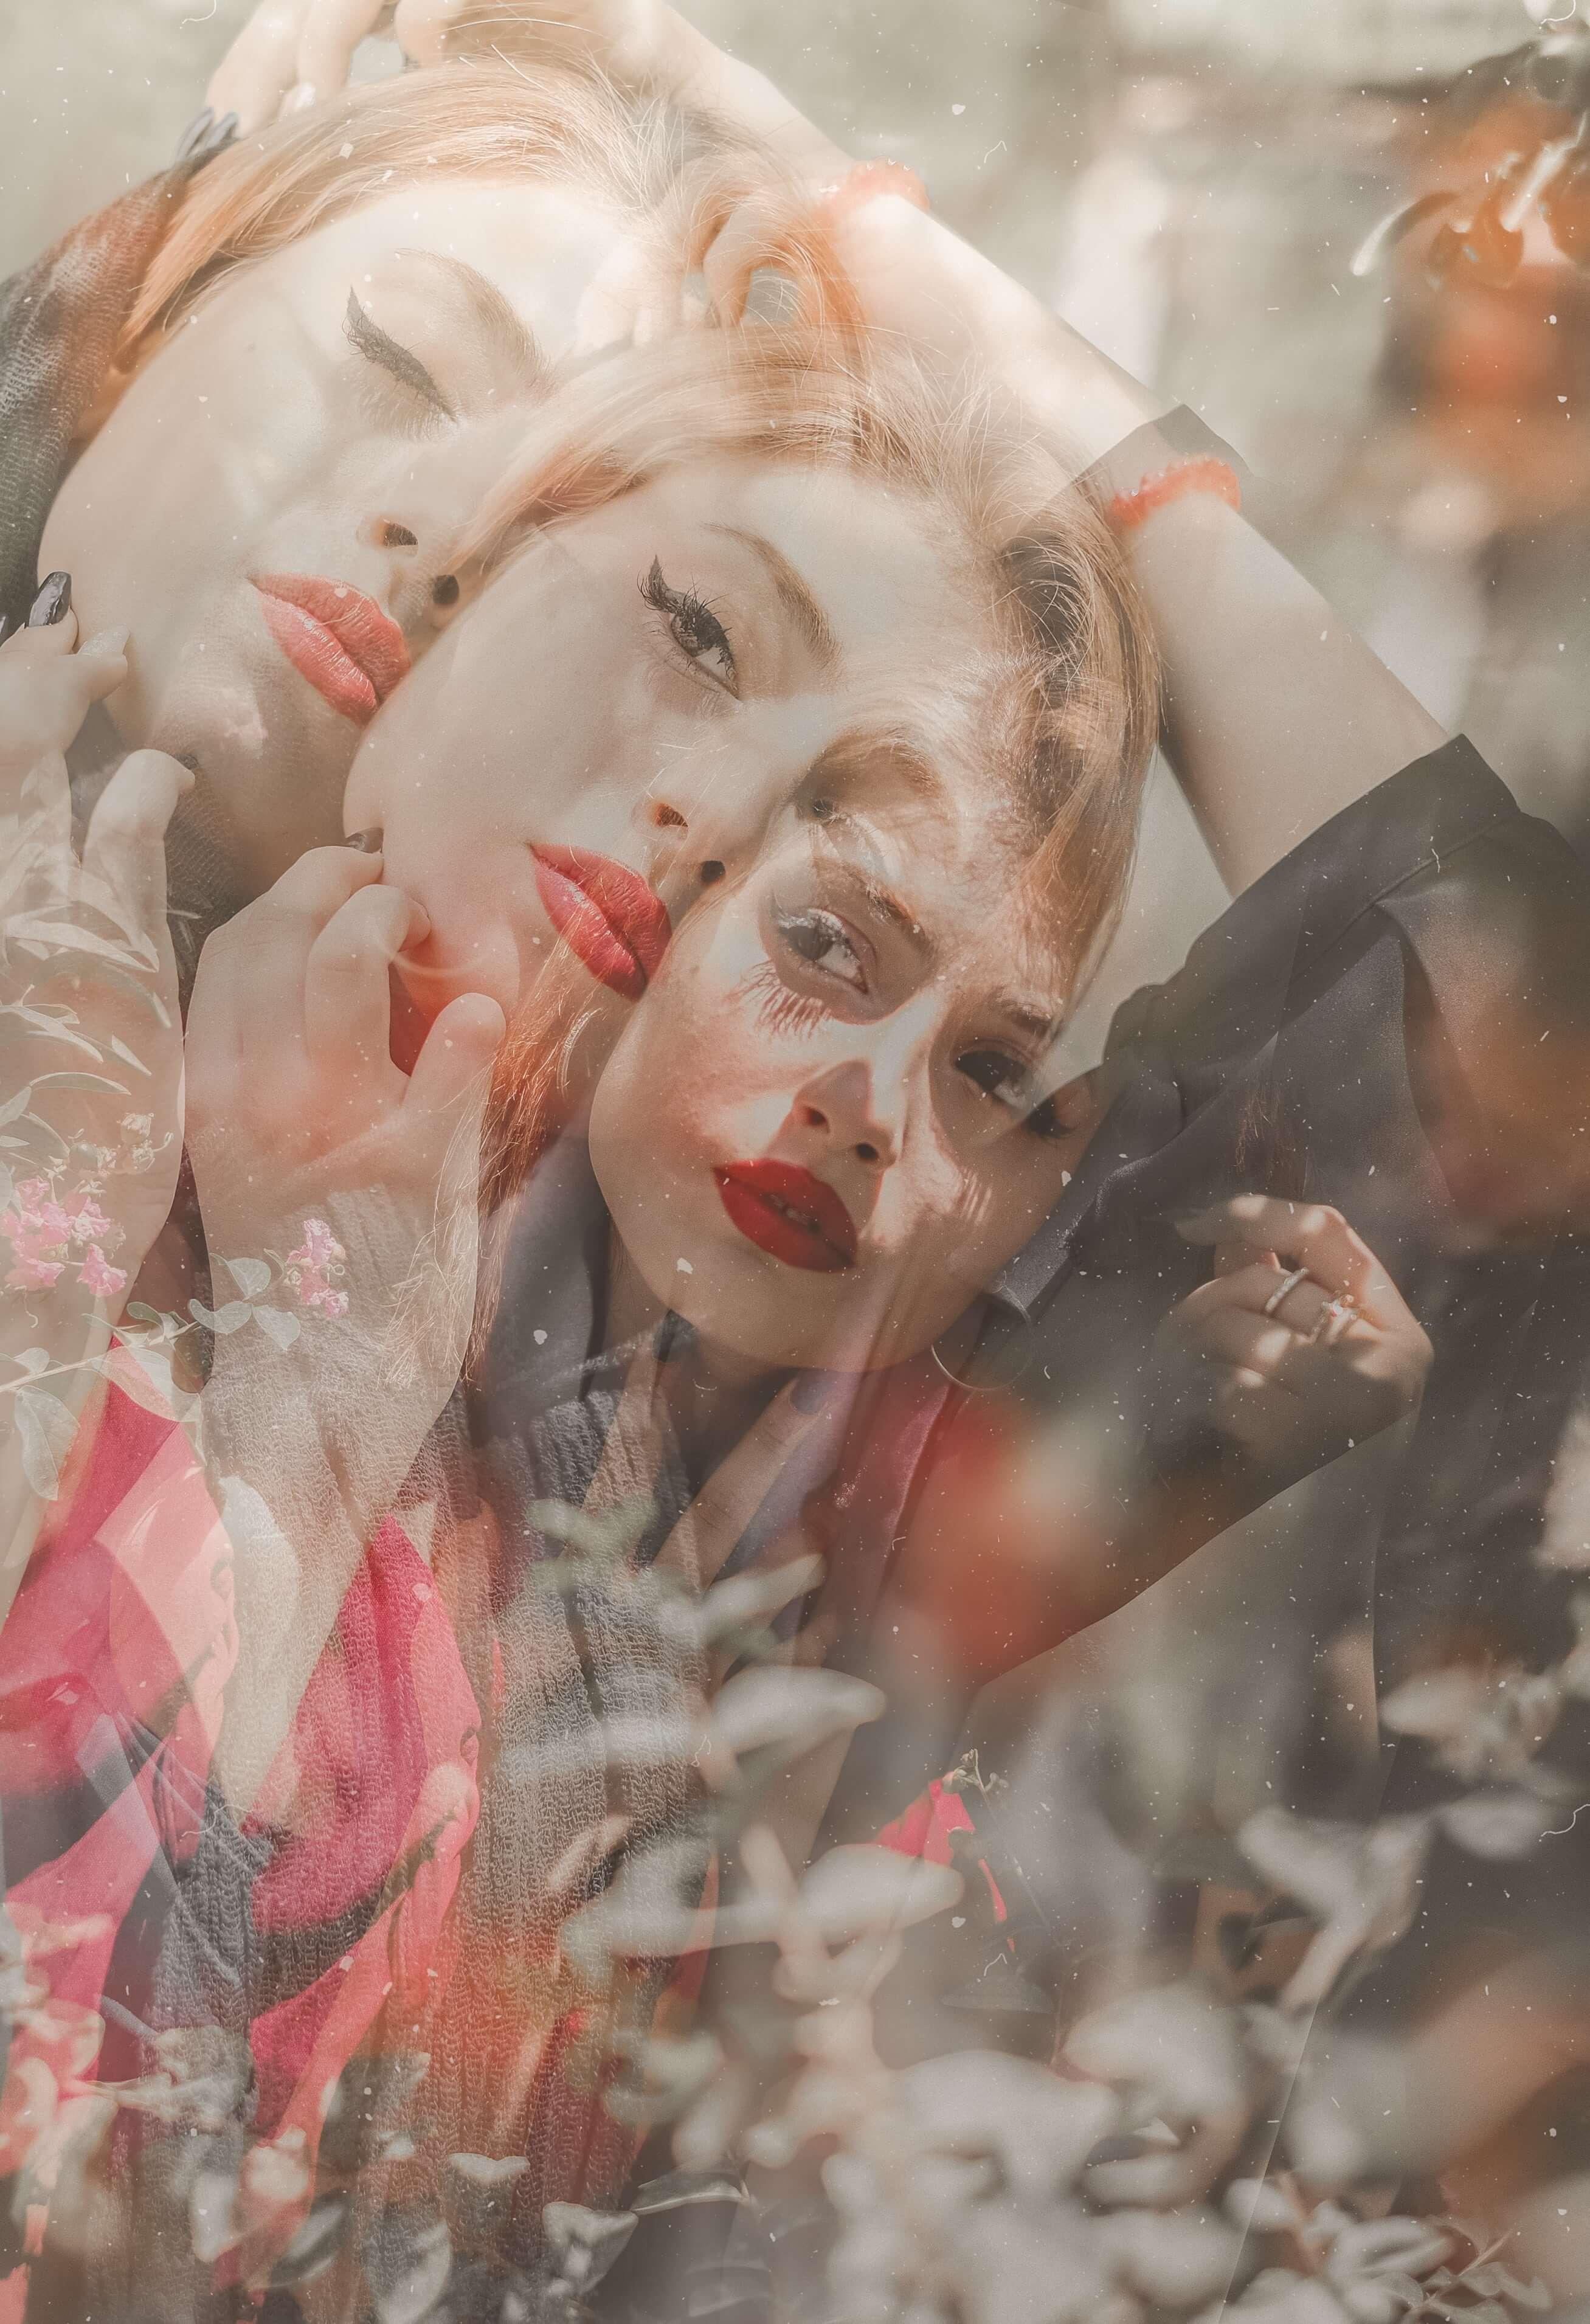 Blurry self-image in mirror.